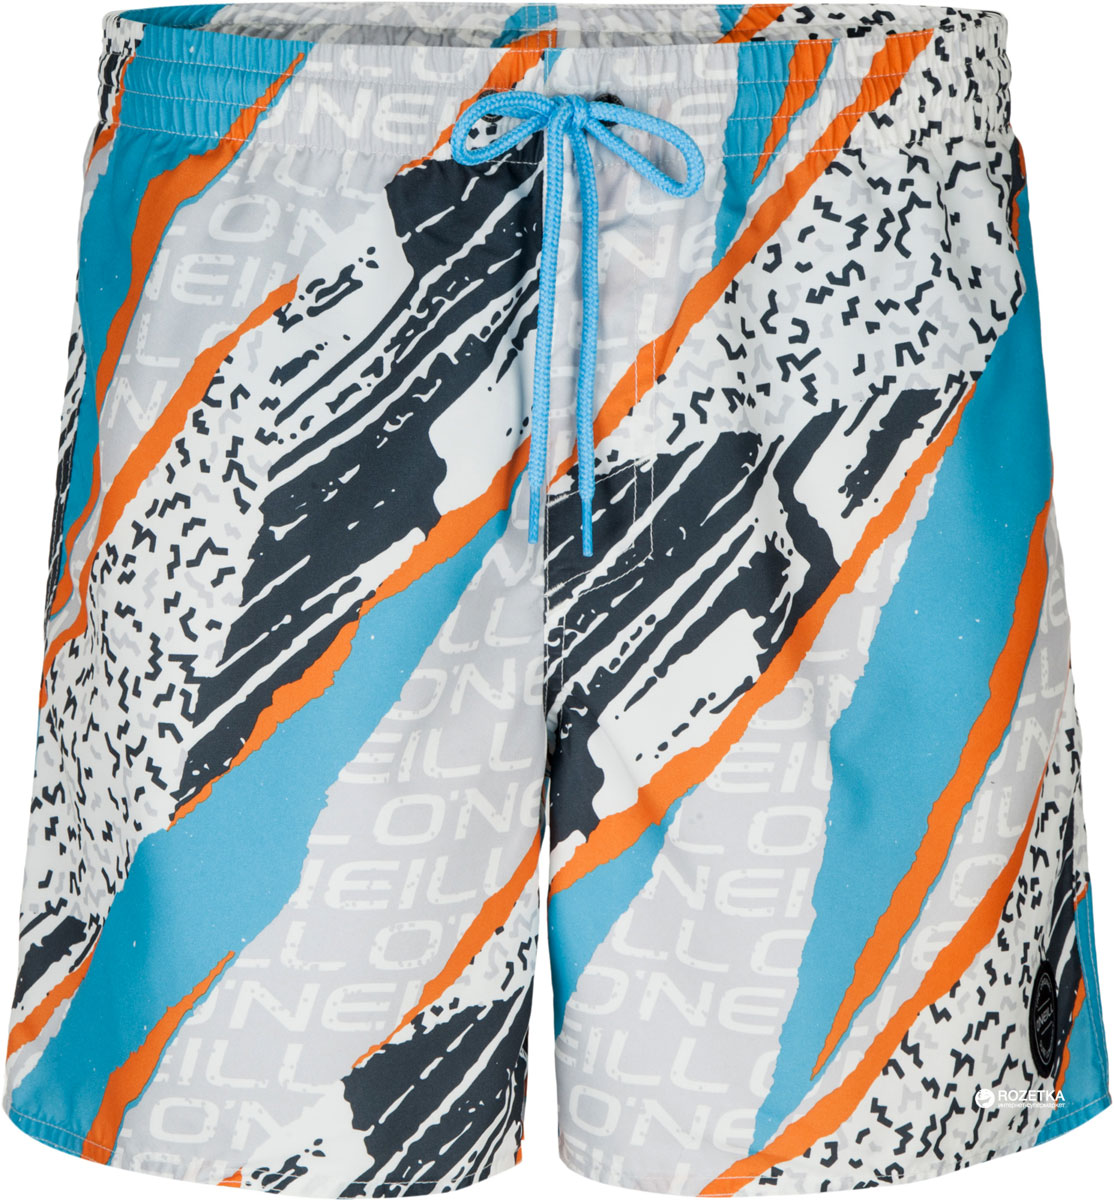 Шорты мужские O'Neill Pm Sunstroke Shorts, цвет: белый, голубой. 8A3601-1900. Размер XL (52/54) шорты мужские speedo fitted leis 13 wsht am цвет серо голубой 8 10609c250 c250 размер xl 52 54